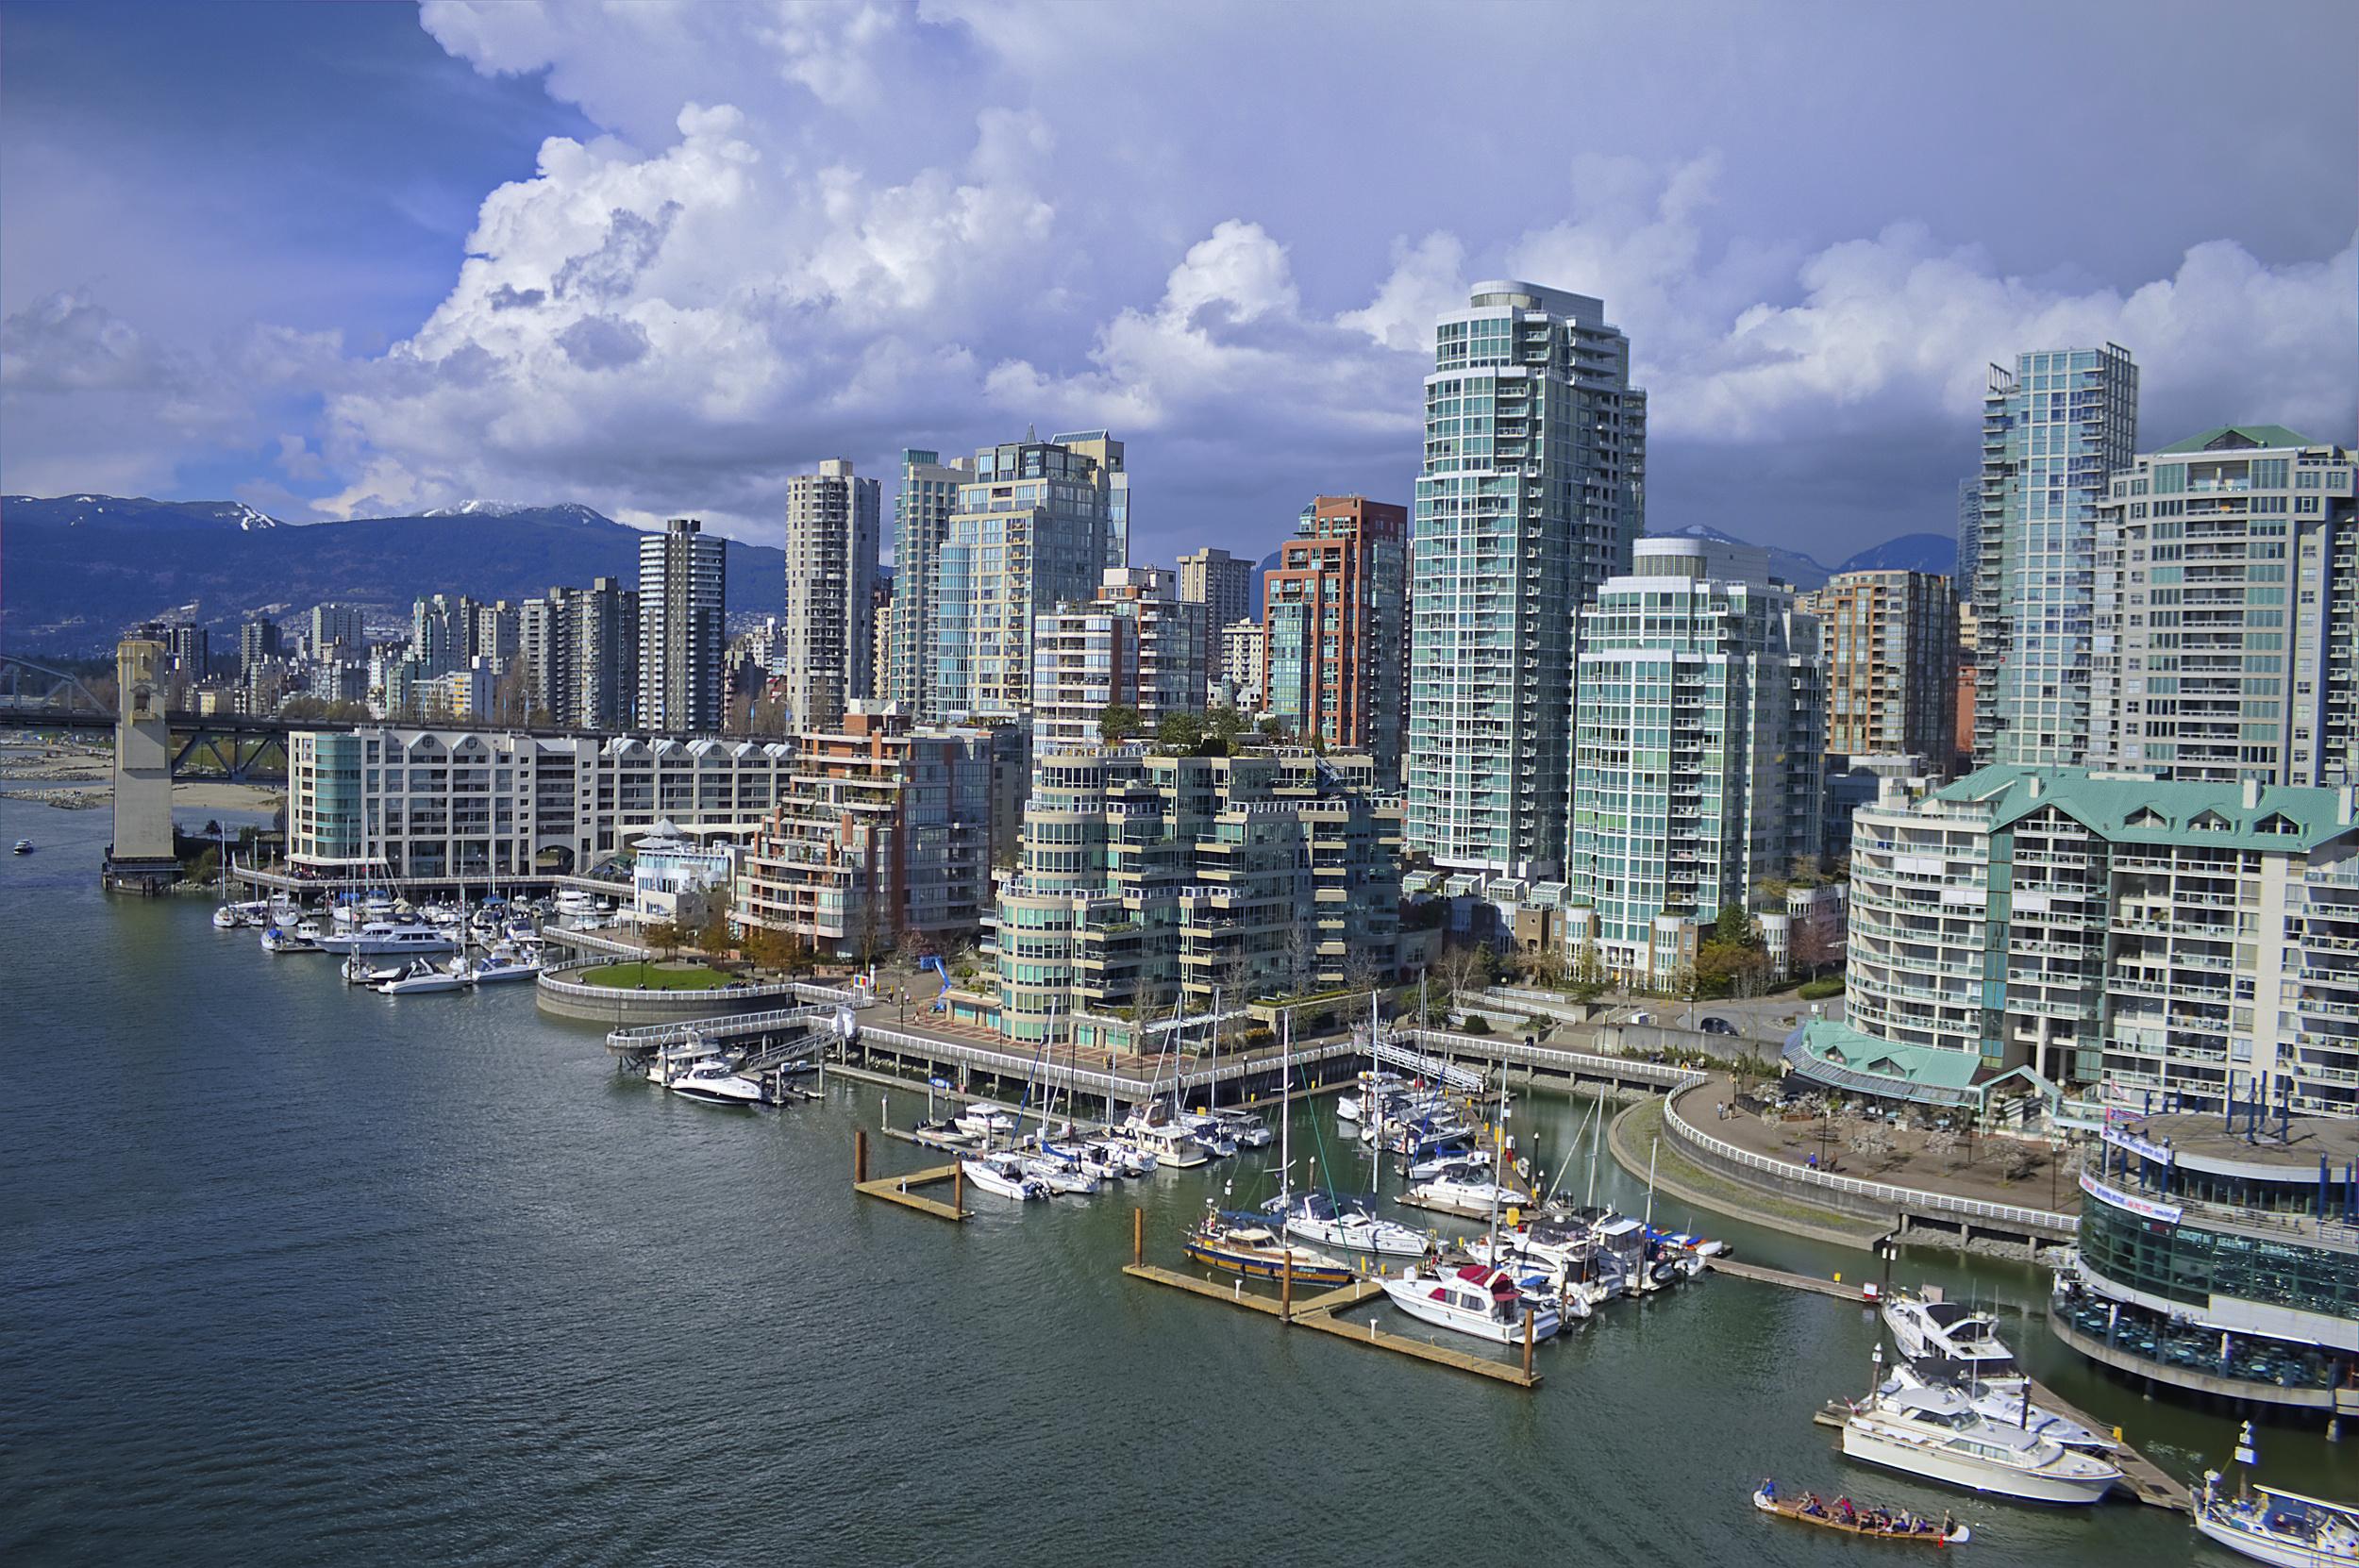 Vancouver Columbia Canada wallpaper 2500x1662 166701 WallpaperUP 2500x1662